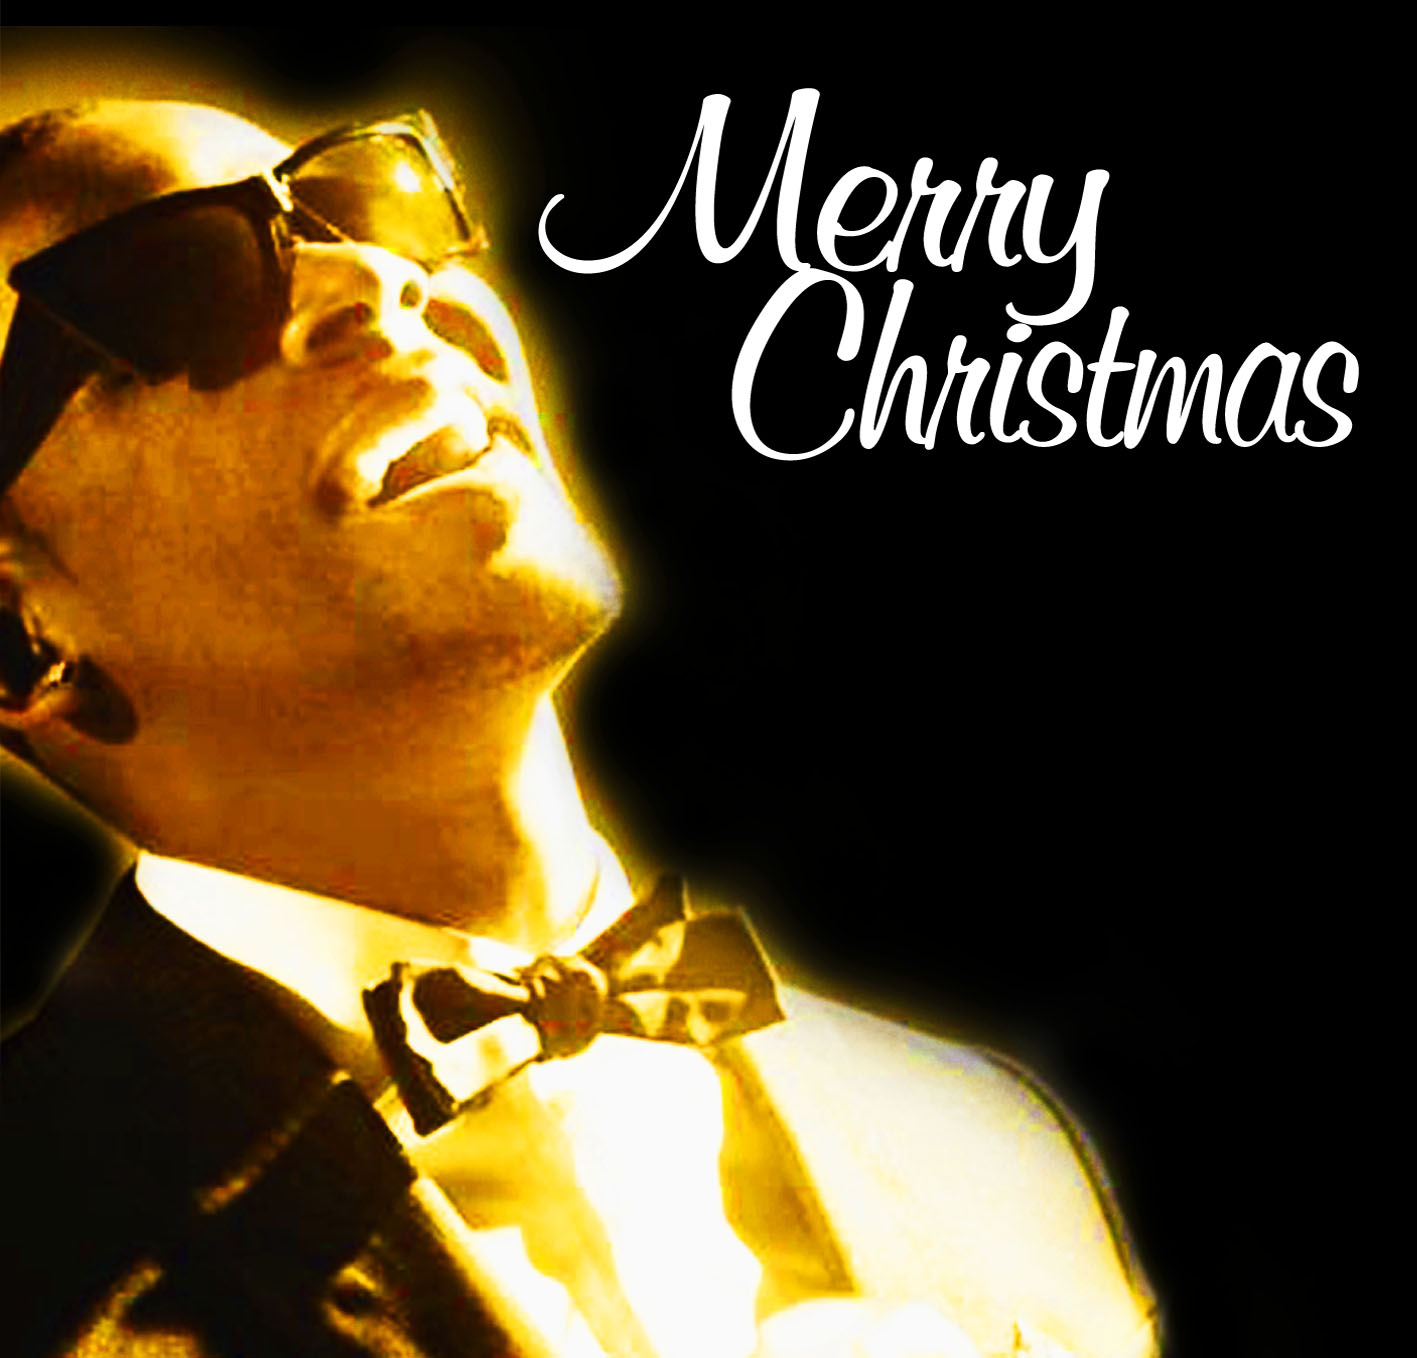 http://2.bp.blogspot.com/_QtAxmyop4x8/TRPsC_9FfdI/AAAAAAAAAao/yk-aLB-M8dQ/s1600/RKelly_1_Christmas.jpg